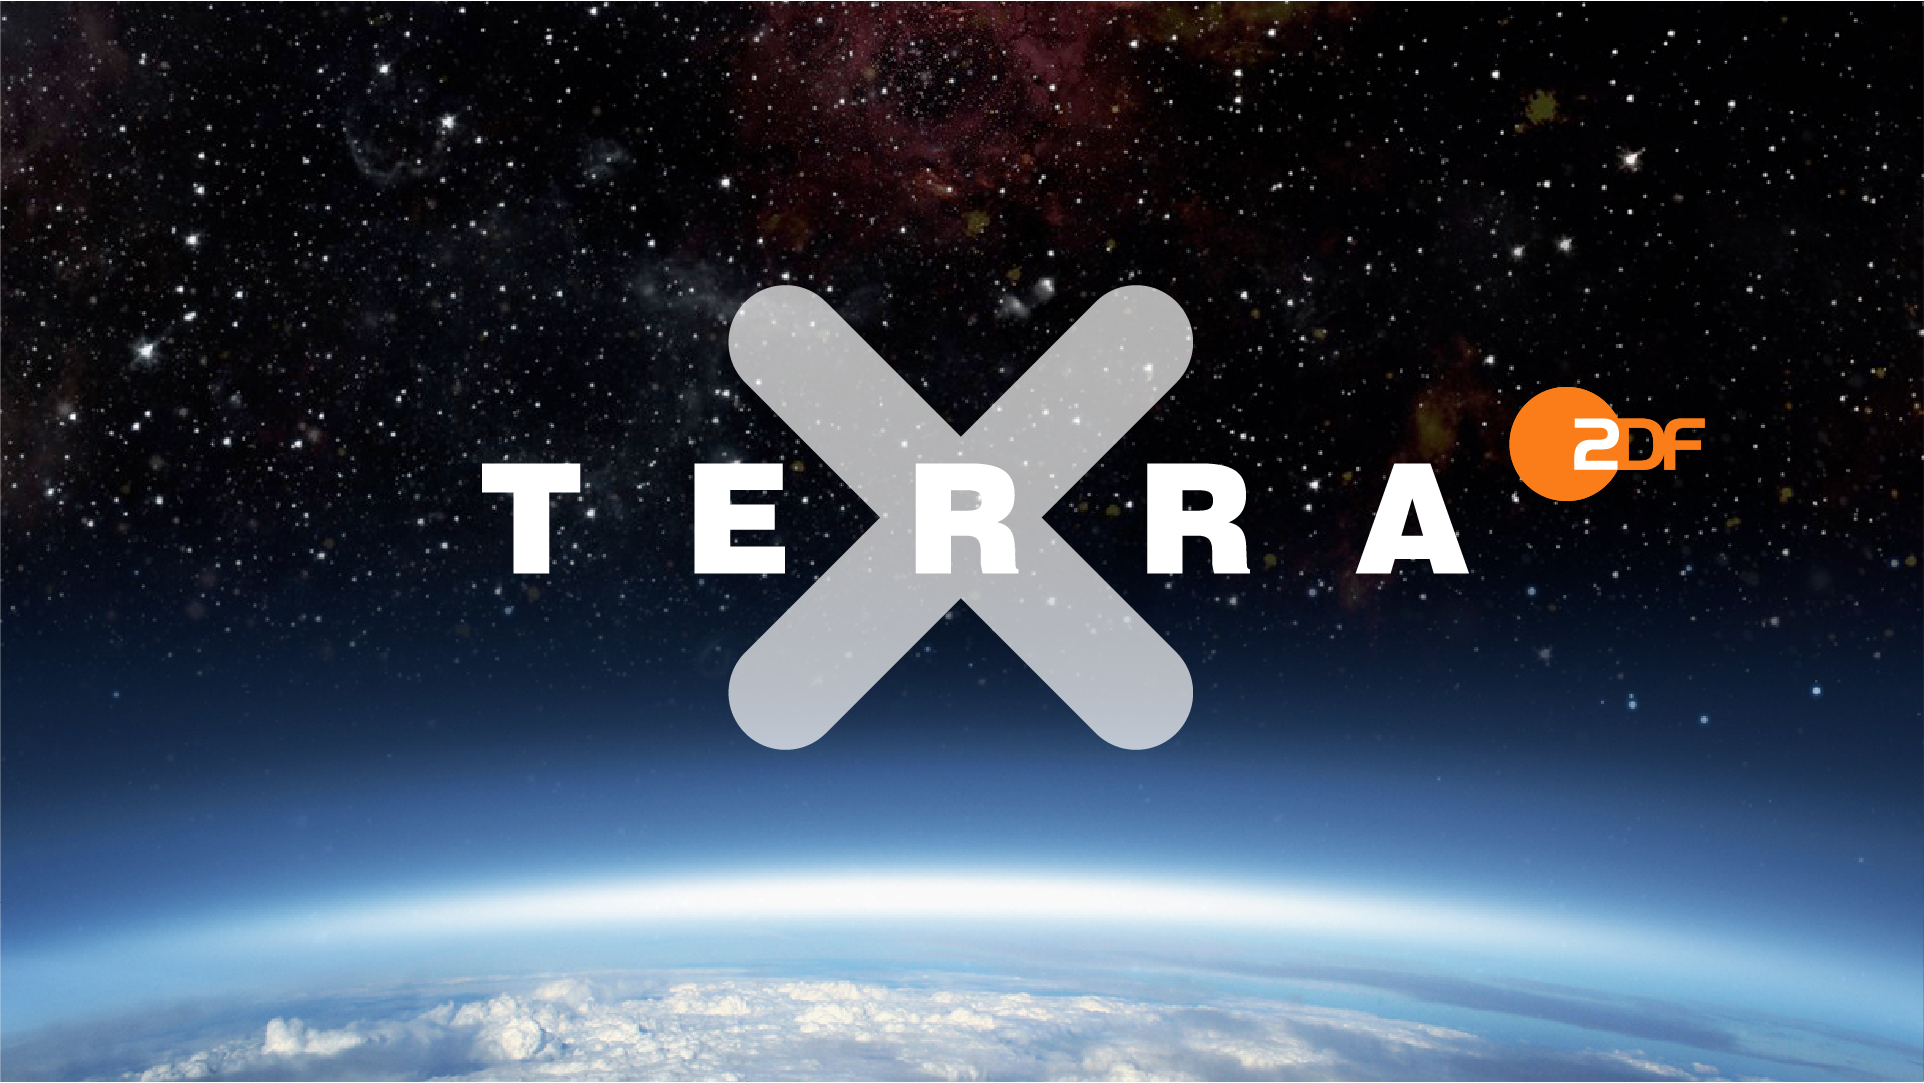 Portal Terra Nl : Terra x spektrum der wissenschaft